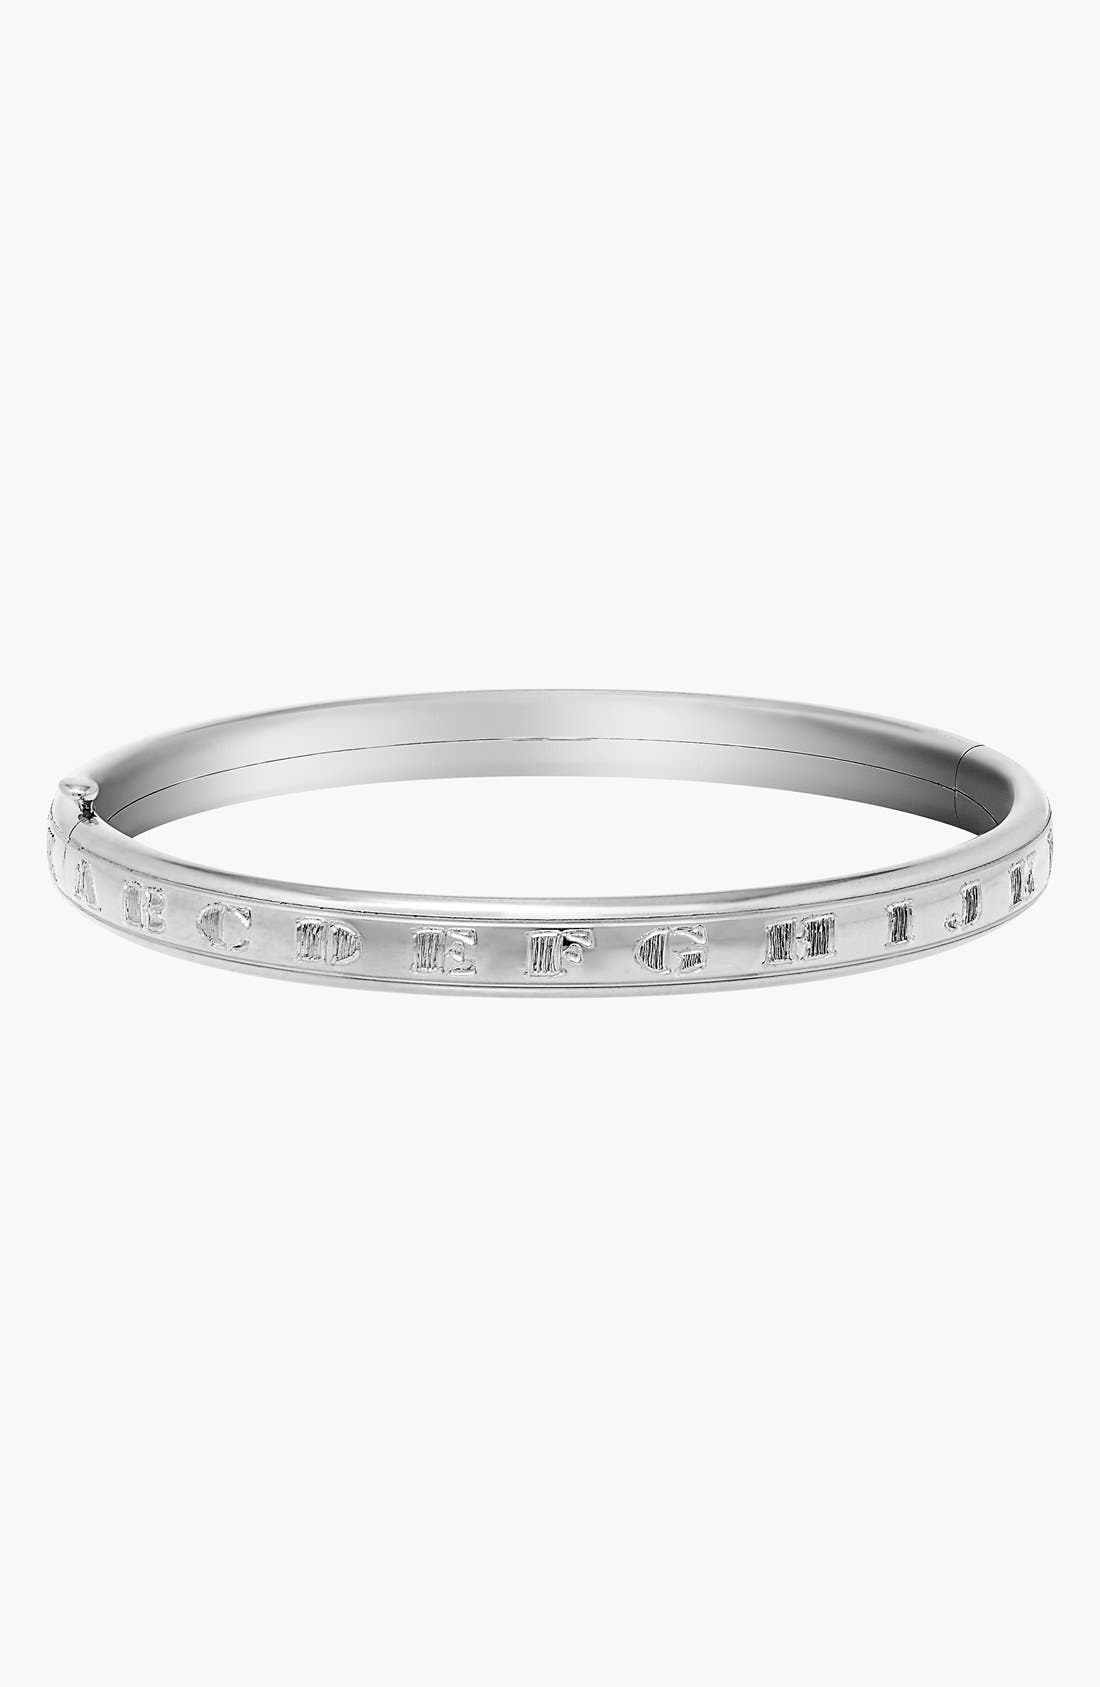 MIGNONETTE A to Z 14k White Gold Bracelet